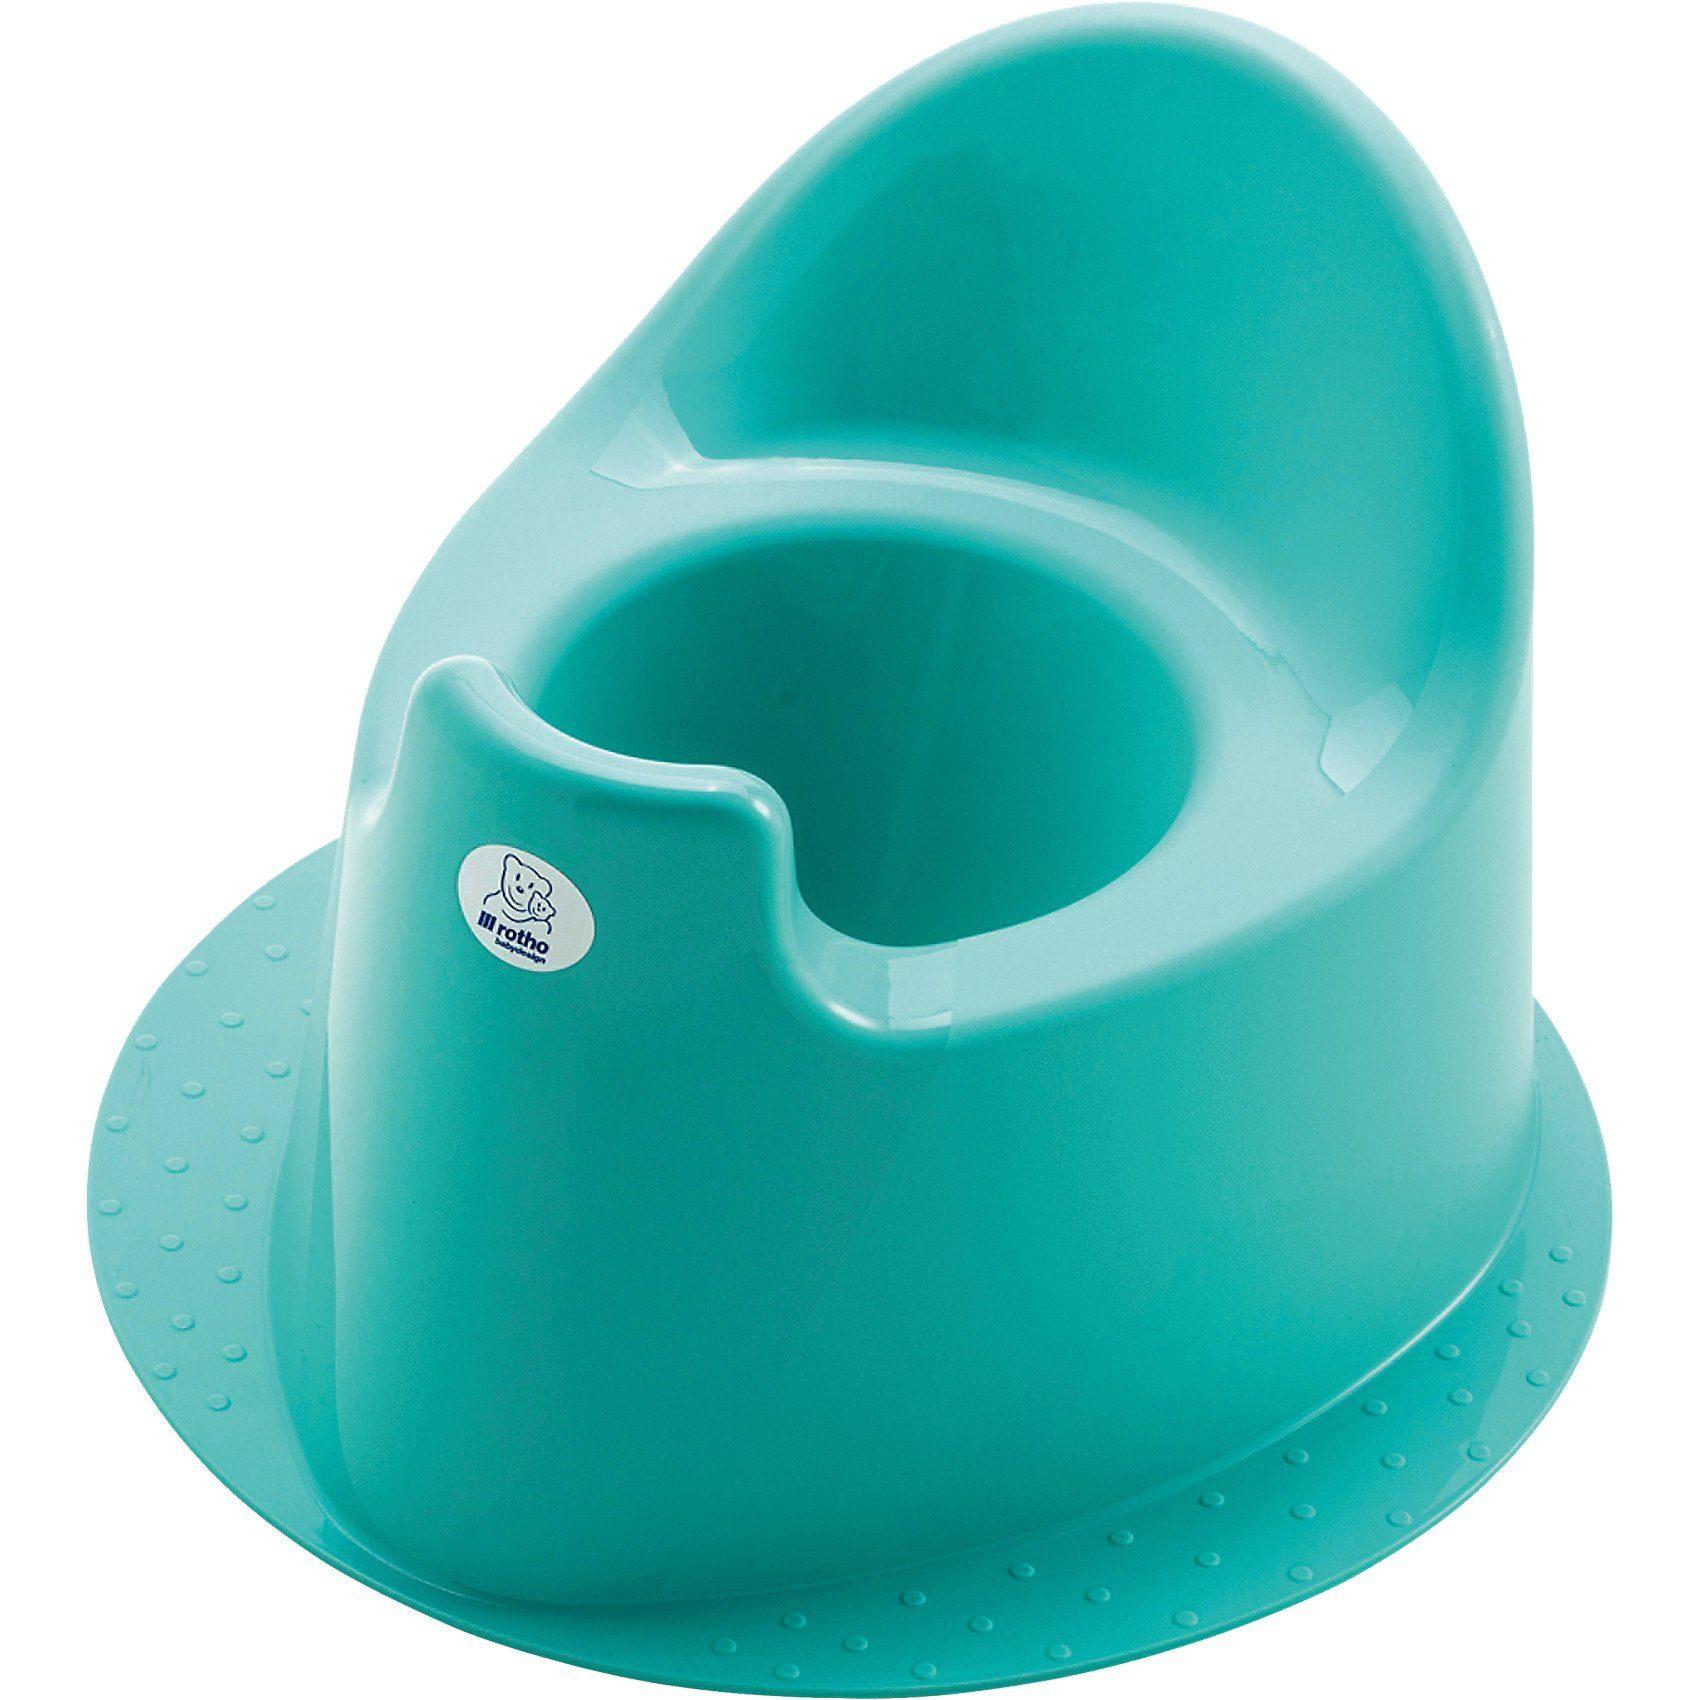 Rotho Babydesign Töpfchen Top, curacao blue